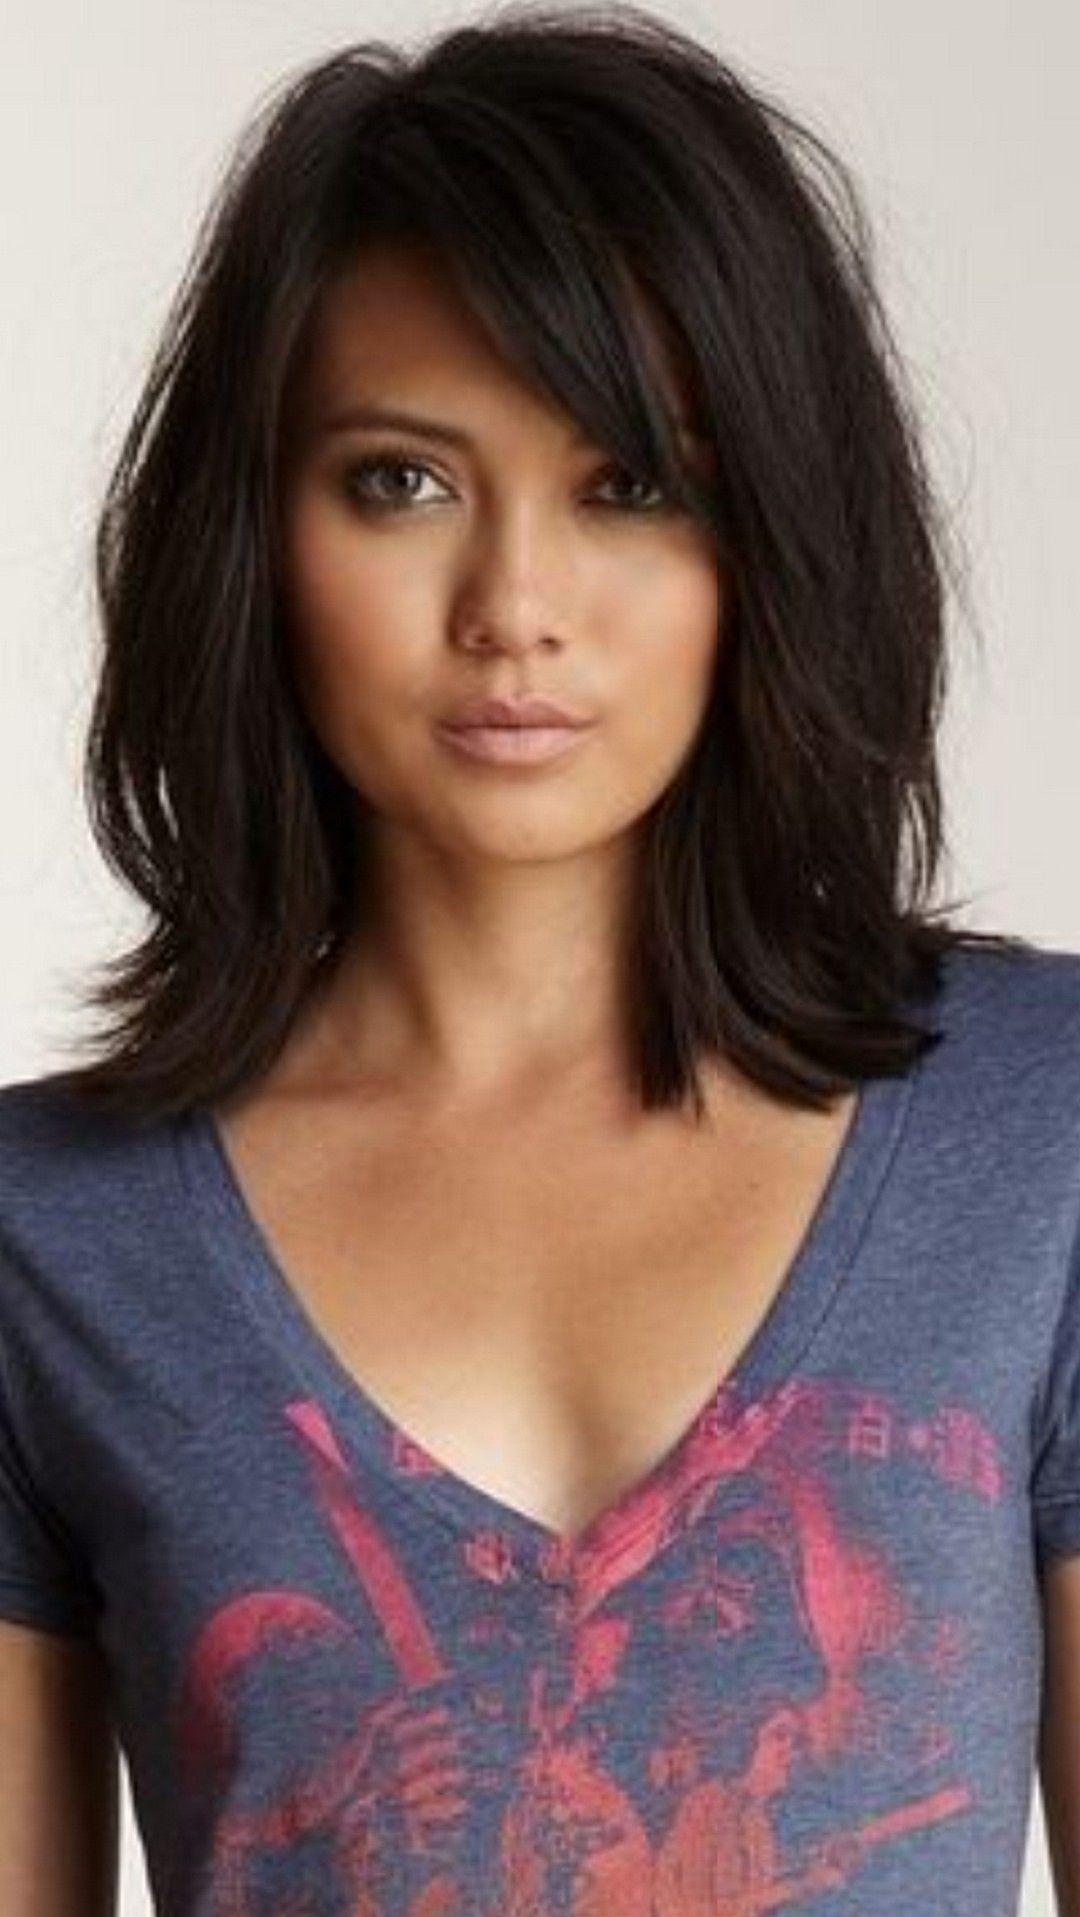 40 New Trends Layered Hair Cuts Layered Hair Hair Cuts And Layering